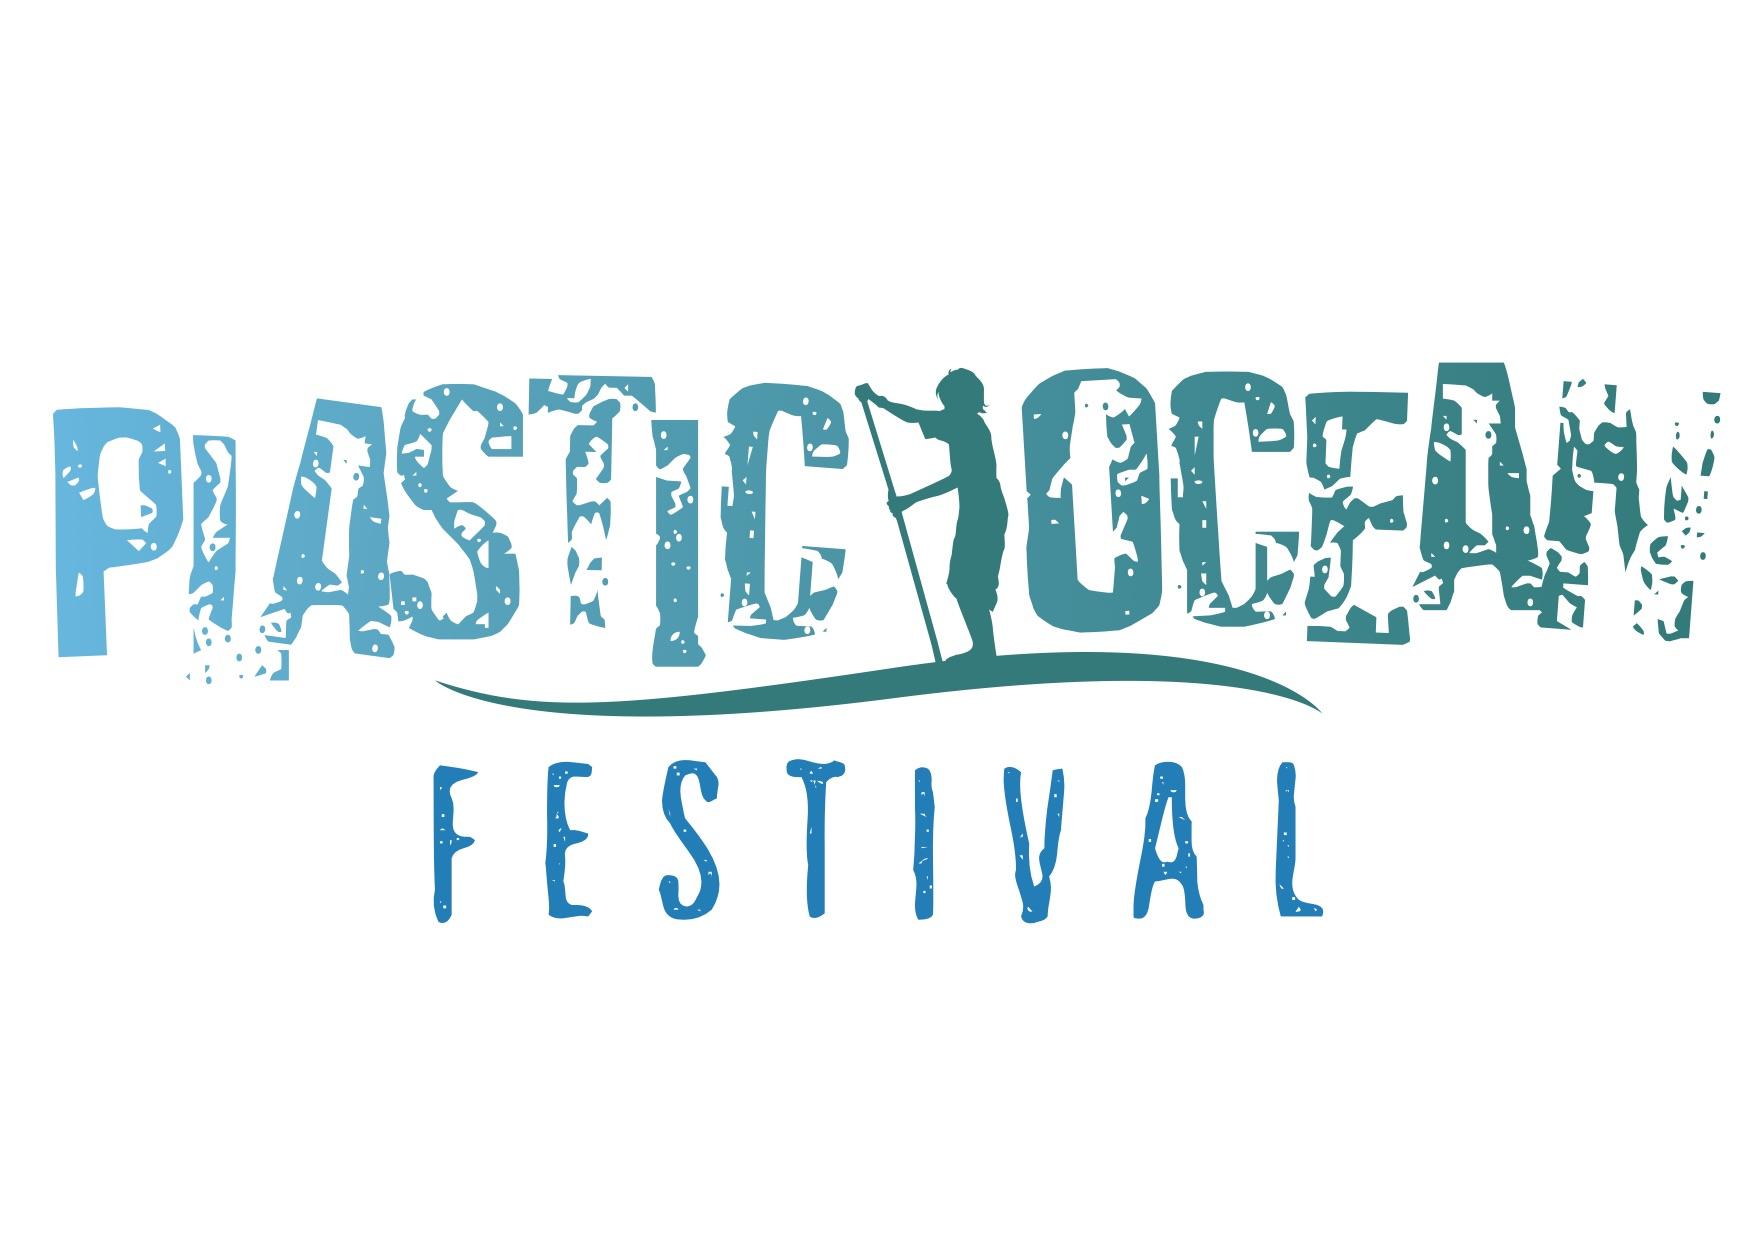 Plastic Ocean Festival